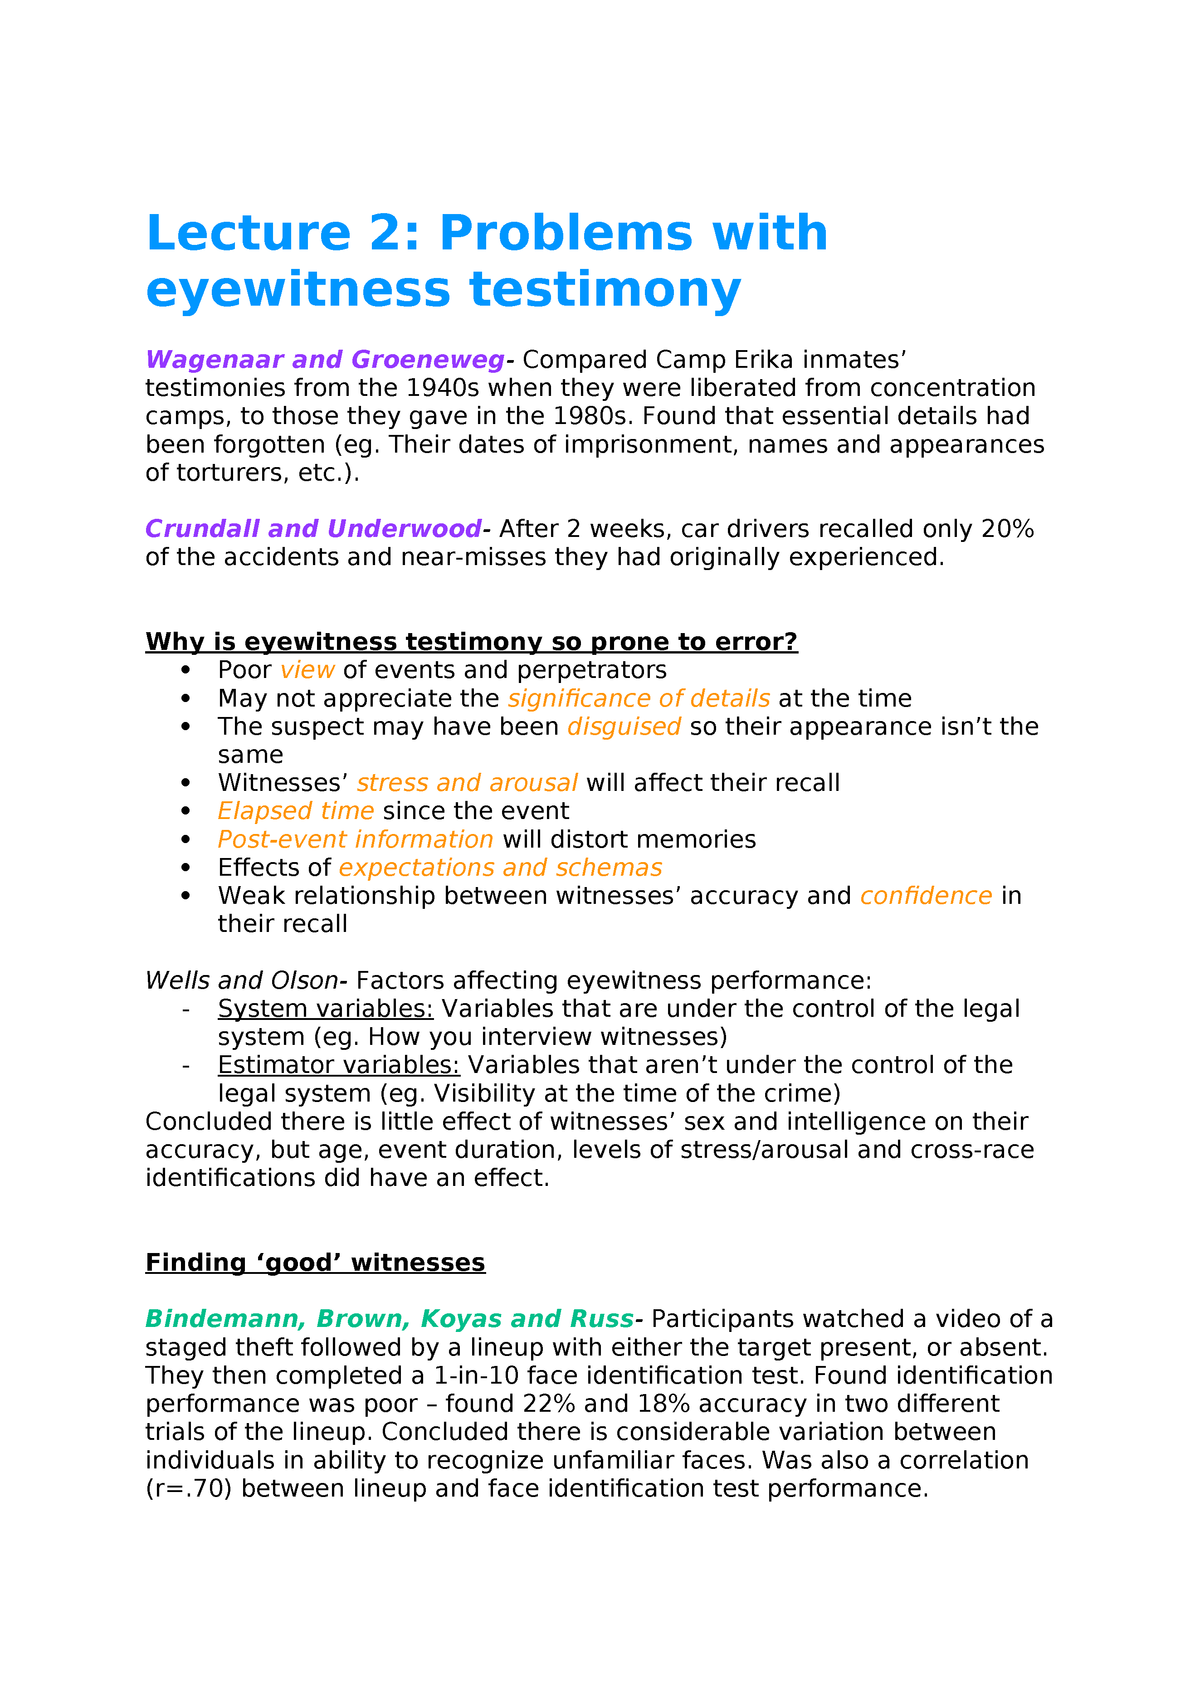 eyewitness memory